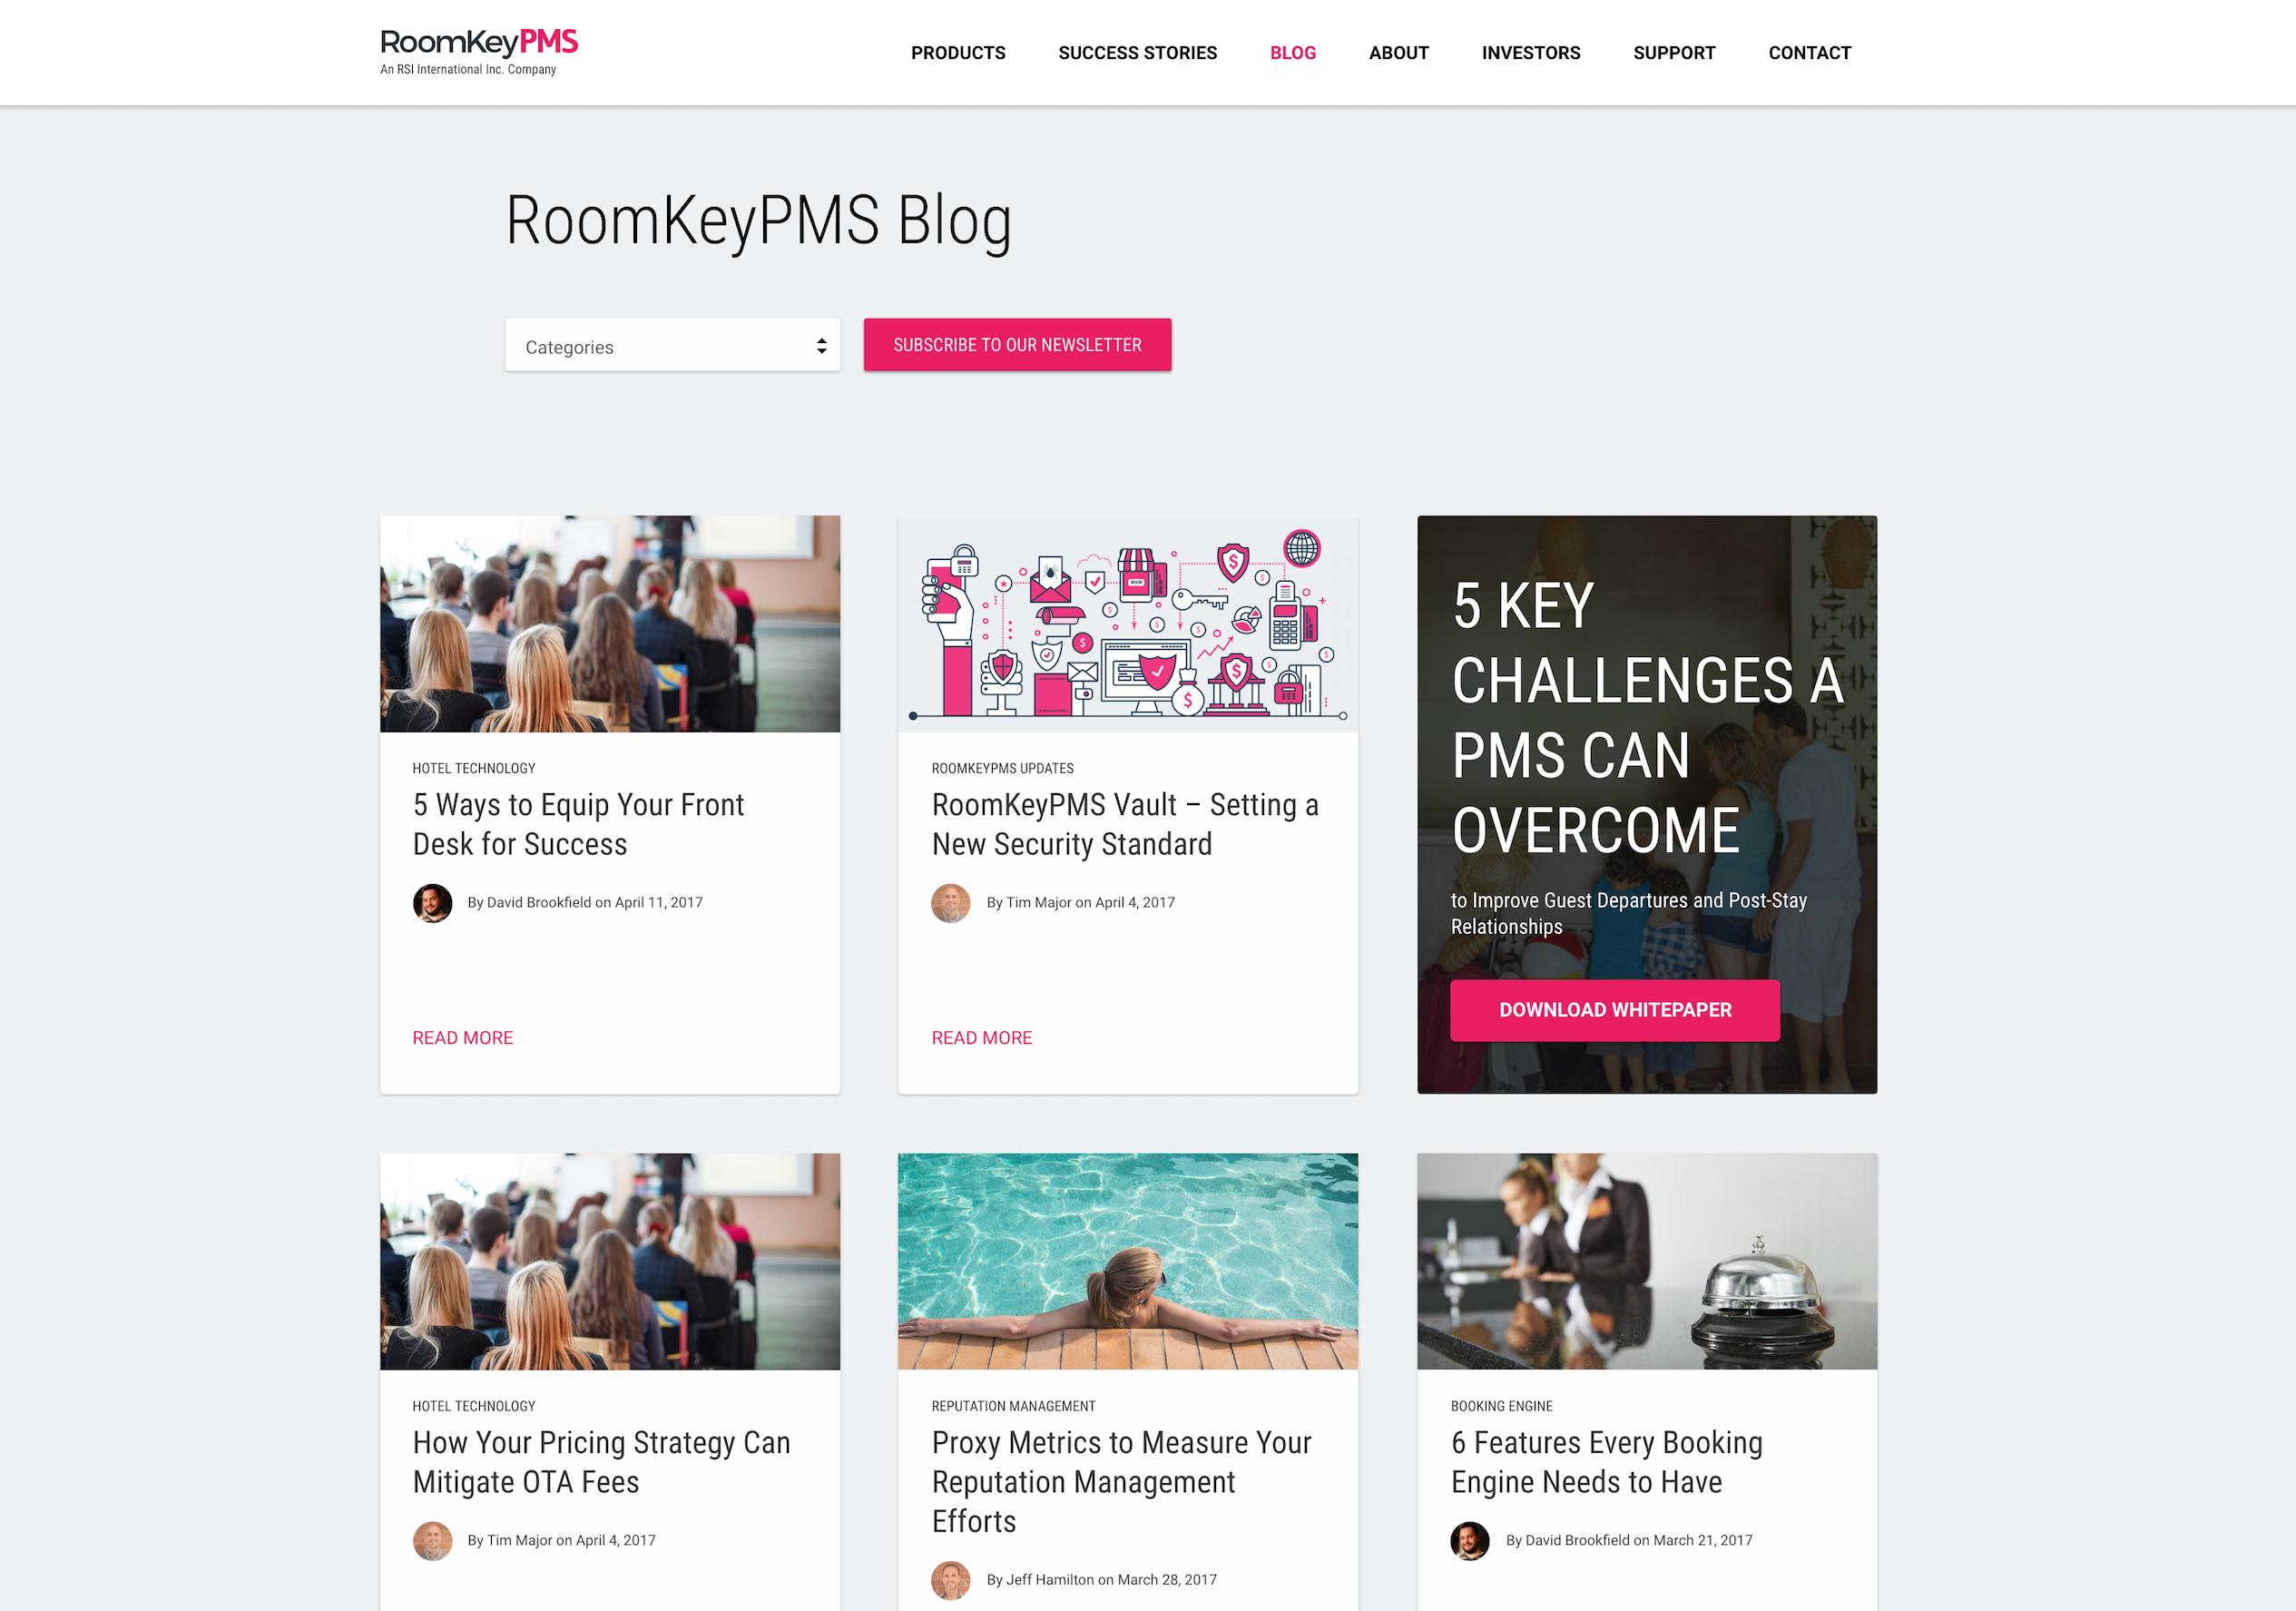 roomkeypms-blog